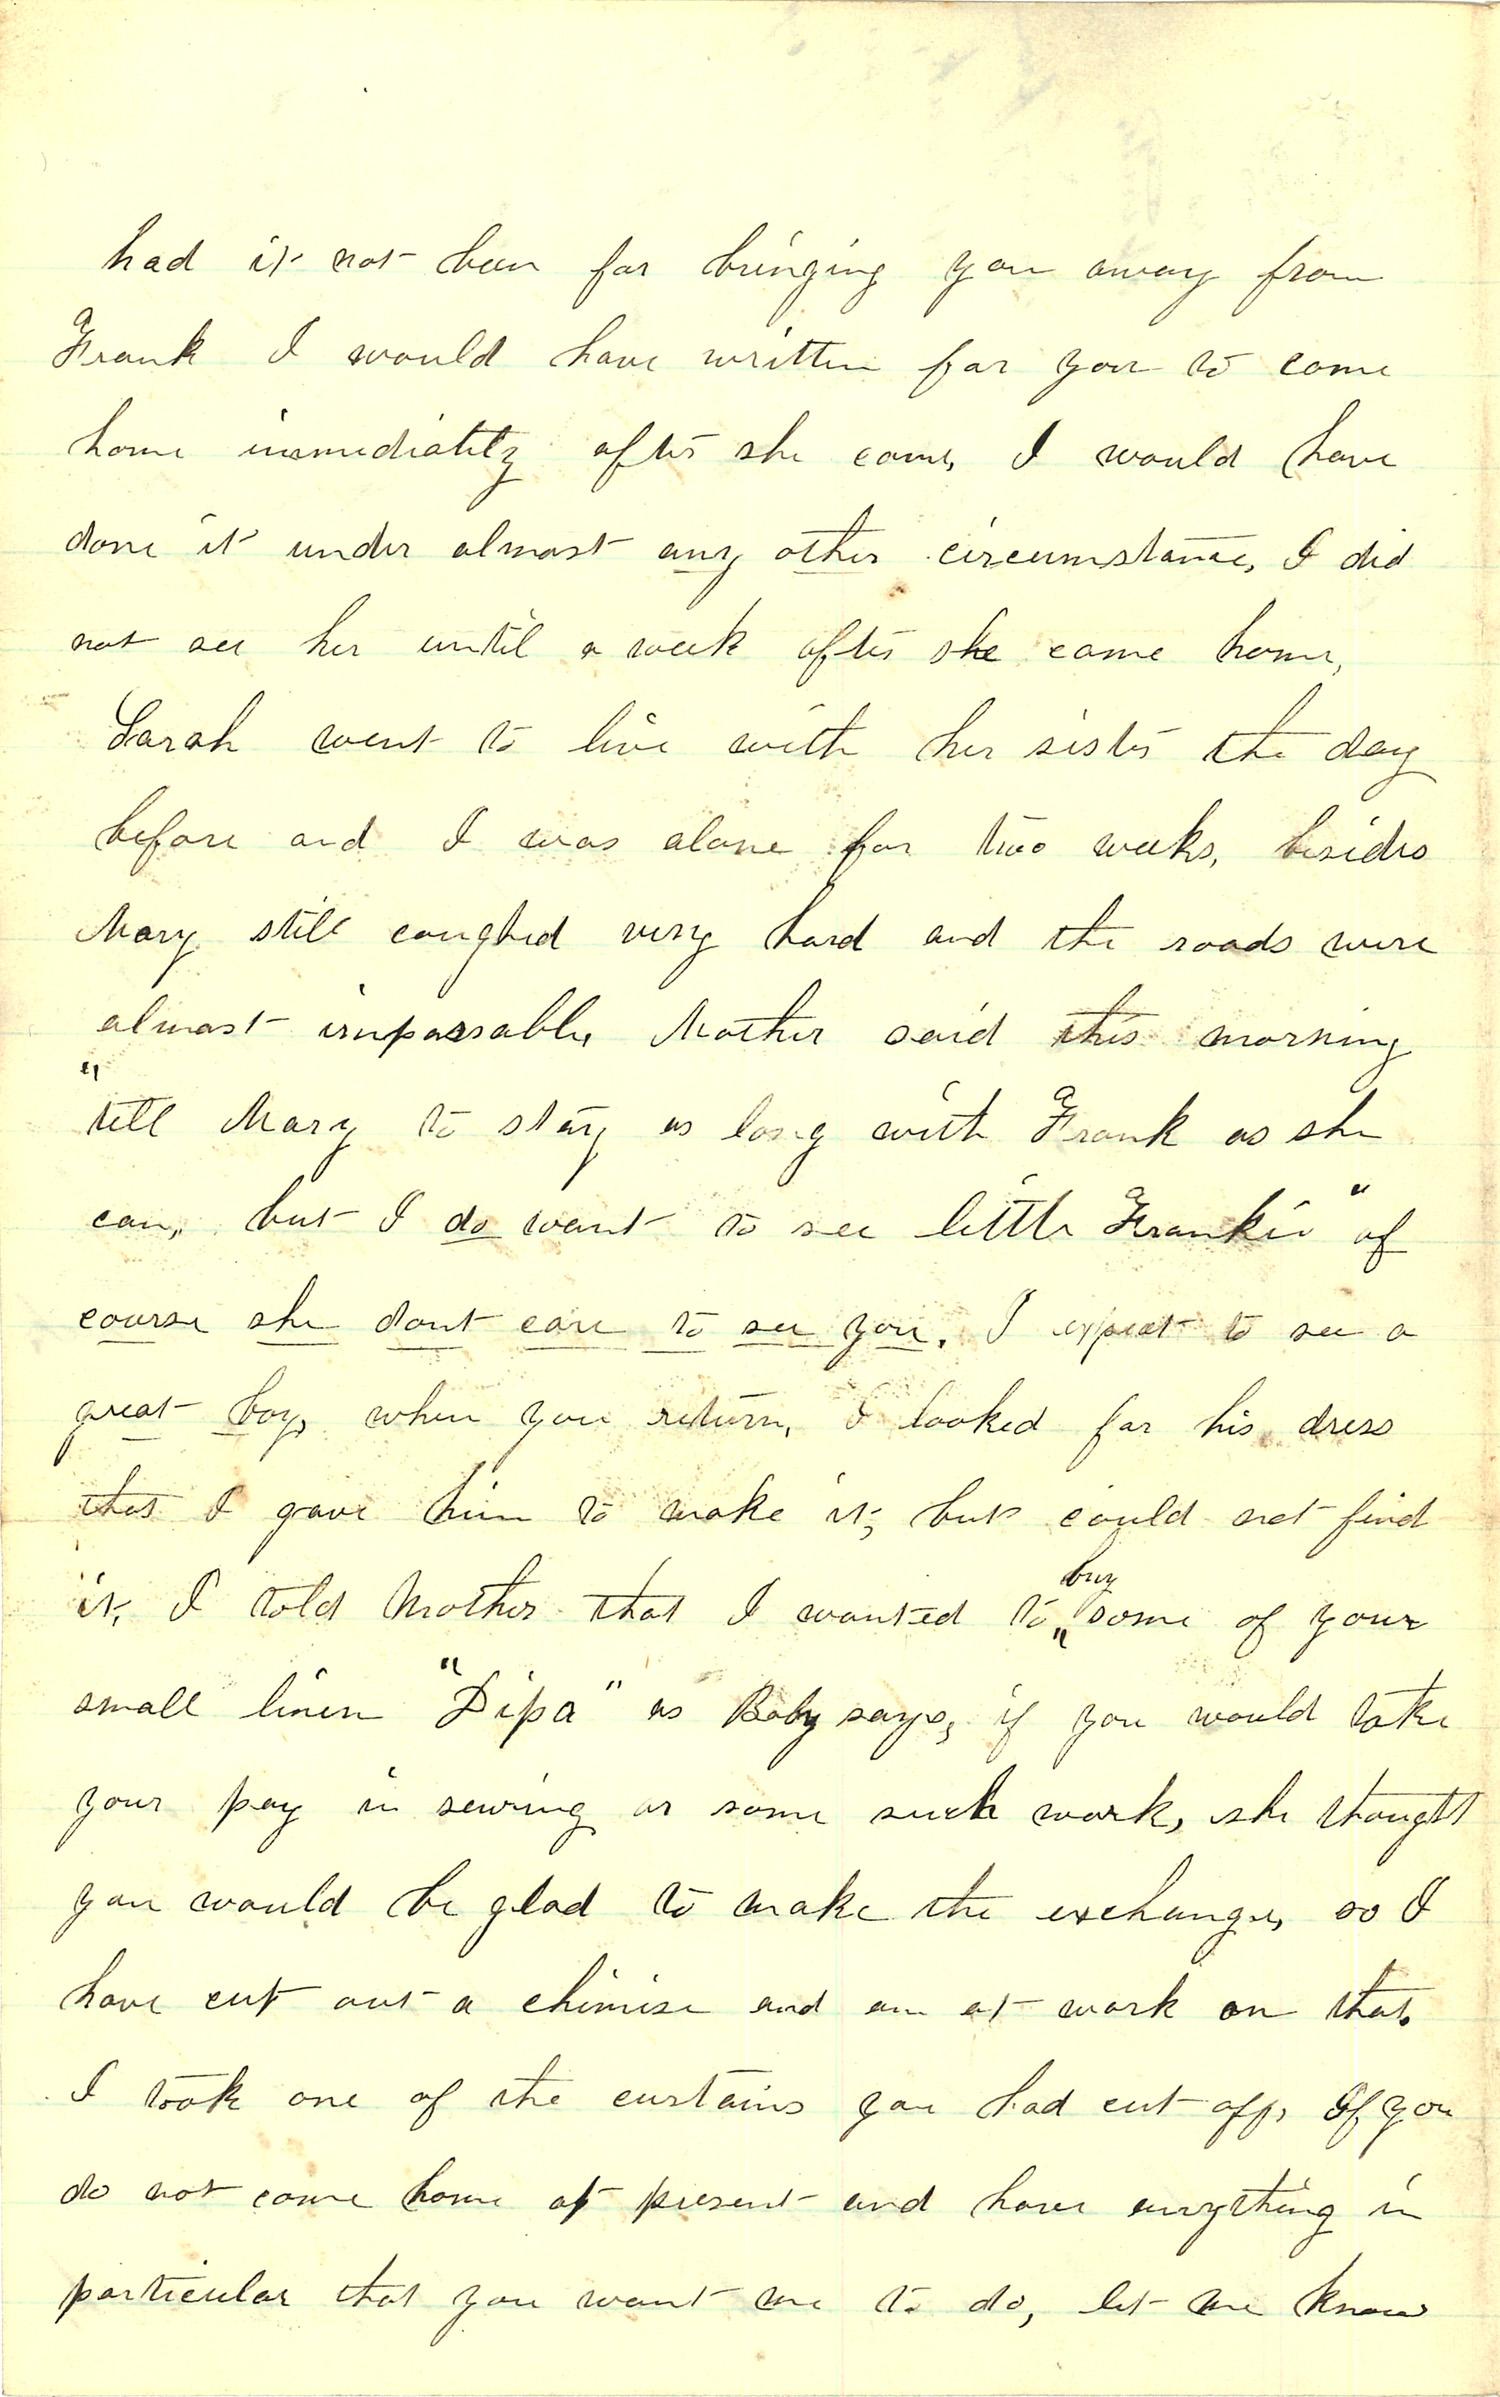 Joseph Culver Letter, March 26, 1863, Page 2